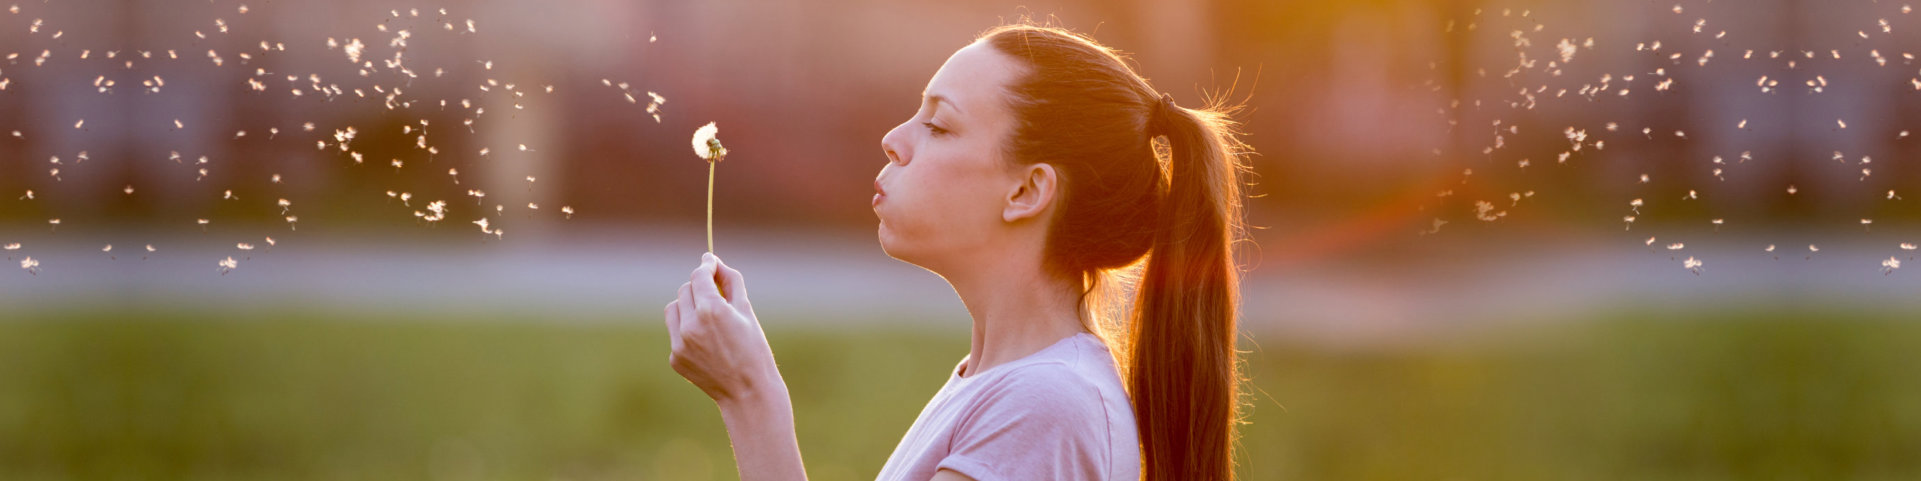 Female blowing flowers